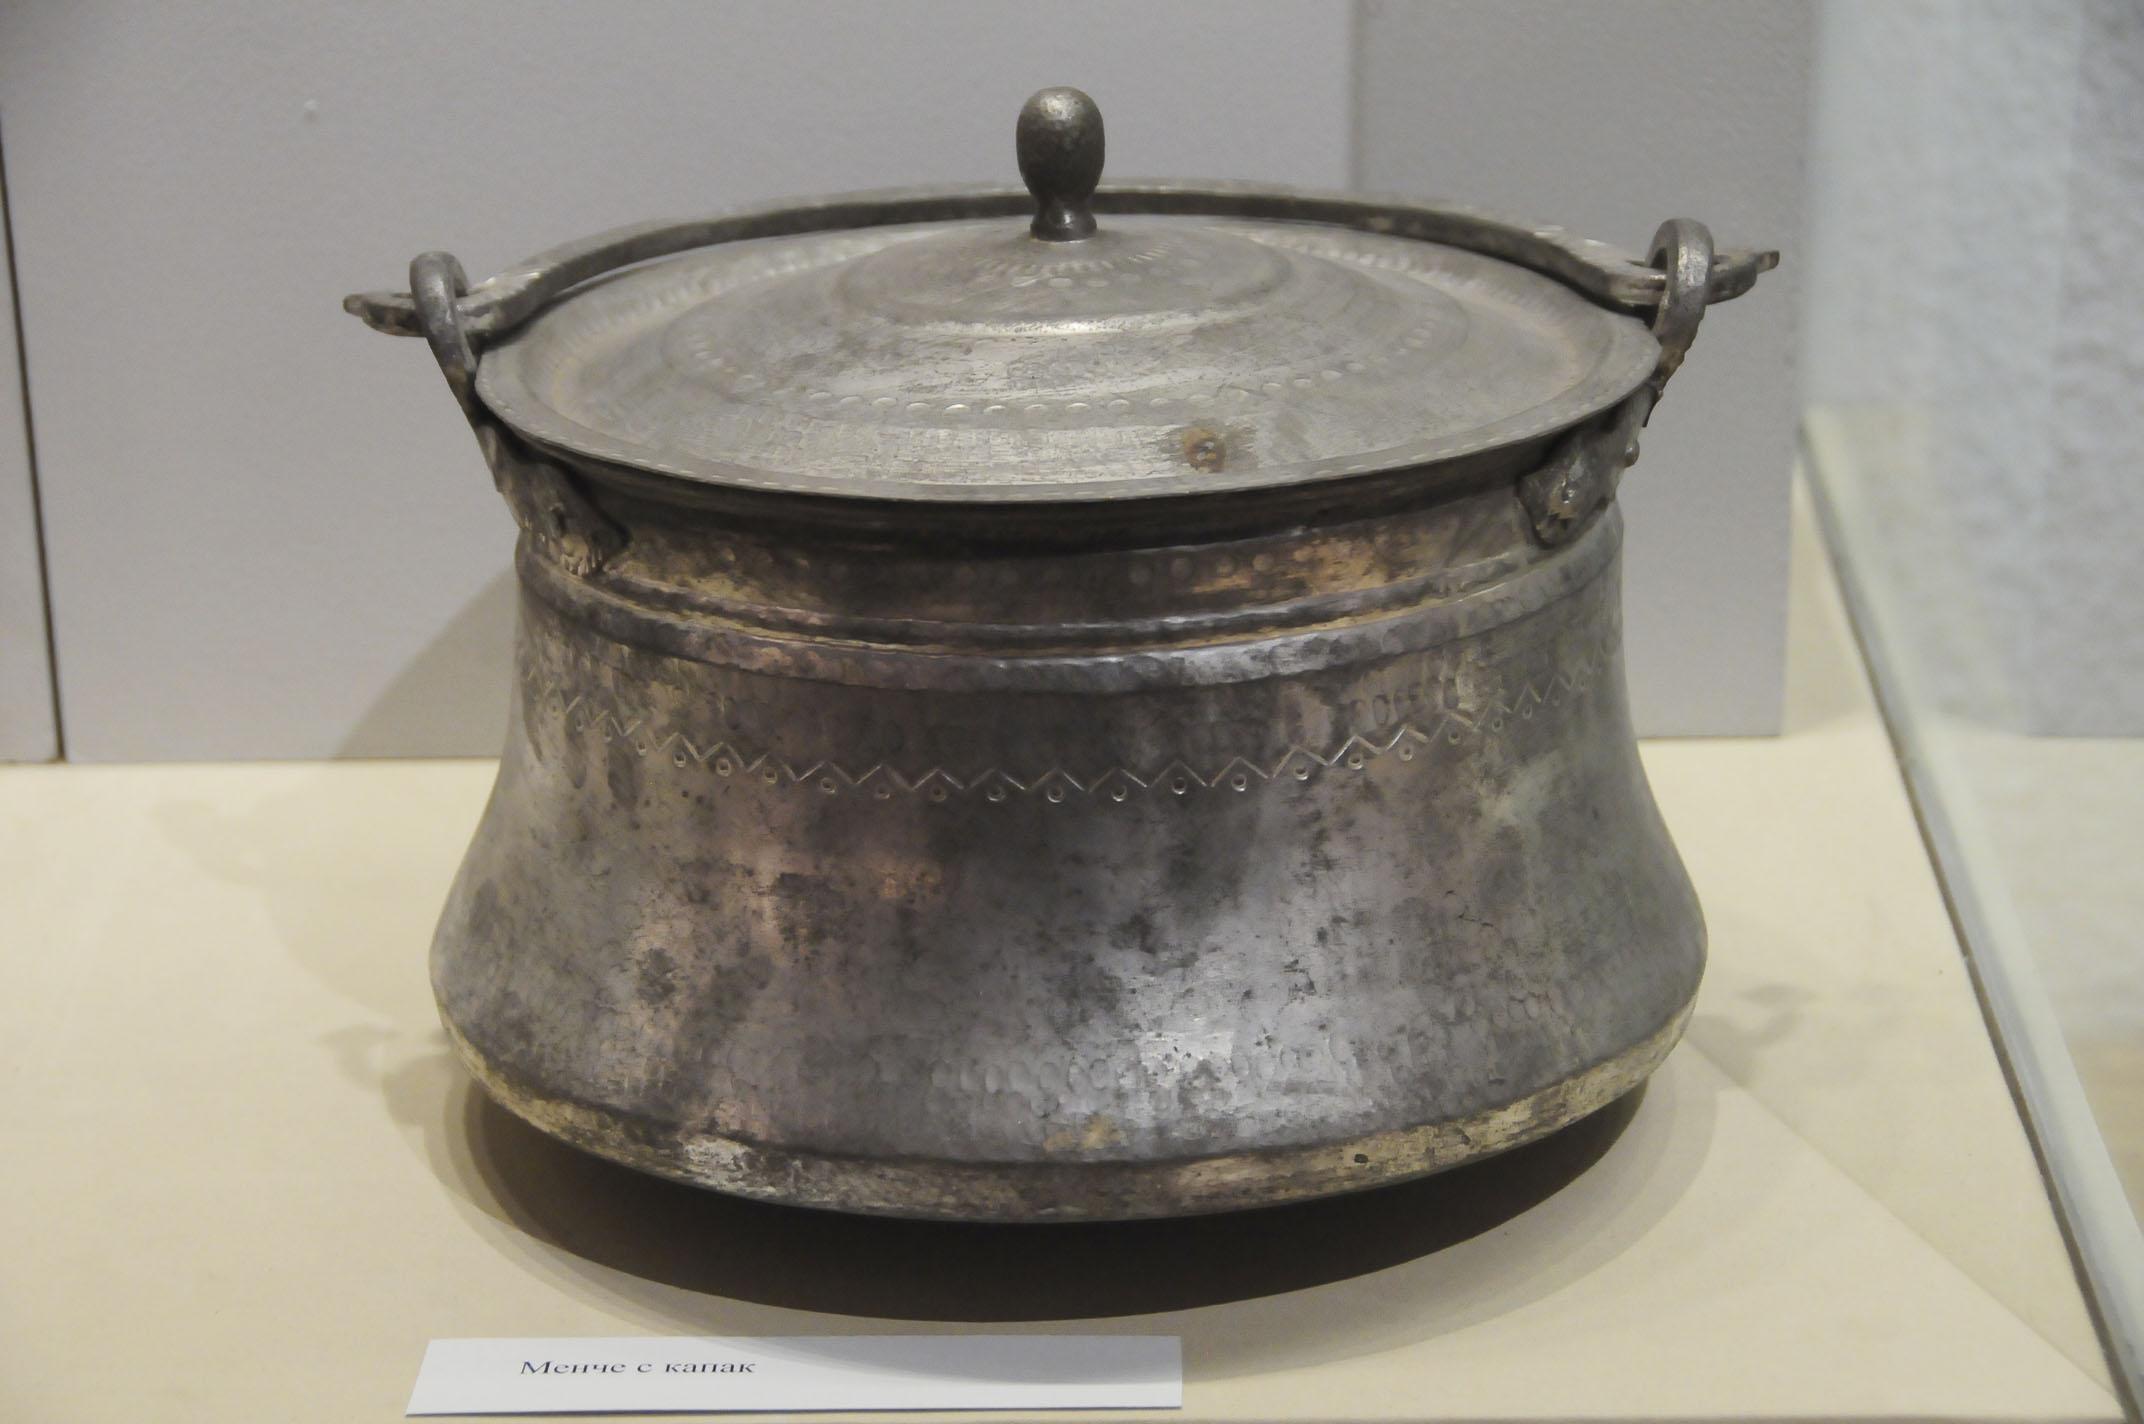 troyan-museum-mednikarstvo-ot-troyanskiq-krai-18